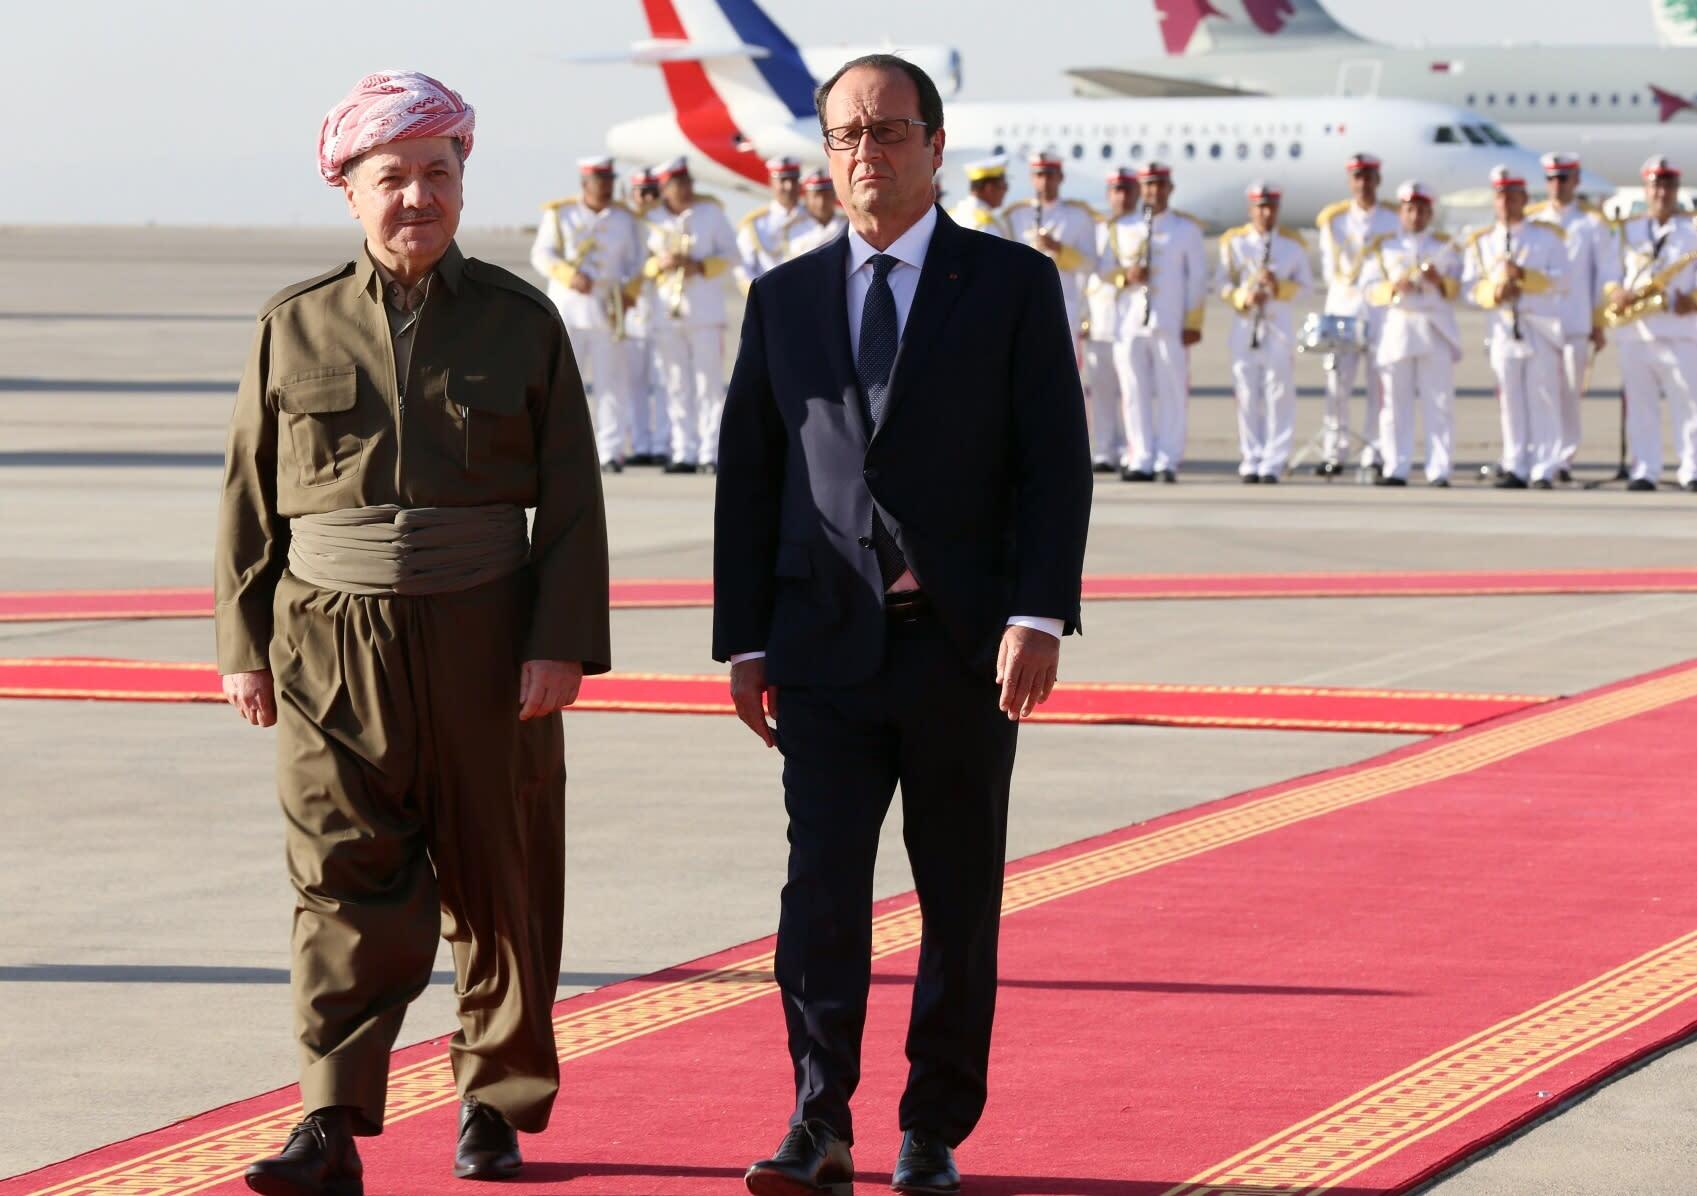 French president Francois Hollande (R) walks with Iraqi Kurdish leader Massud Barzani in Arbil, the capital of the Kurdish autonomous region in northern Iraq, on September 12, 2014 (AFP Photo/Safin Hamed)